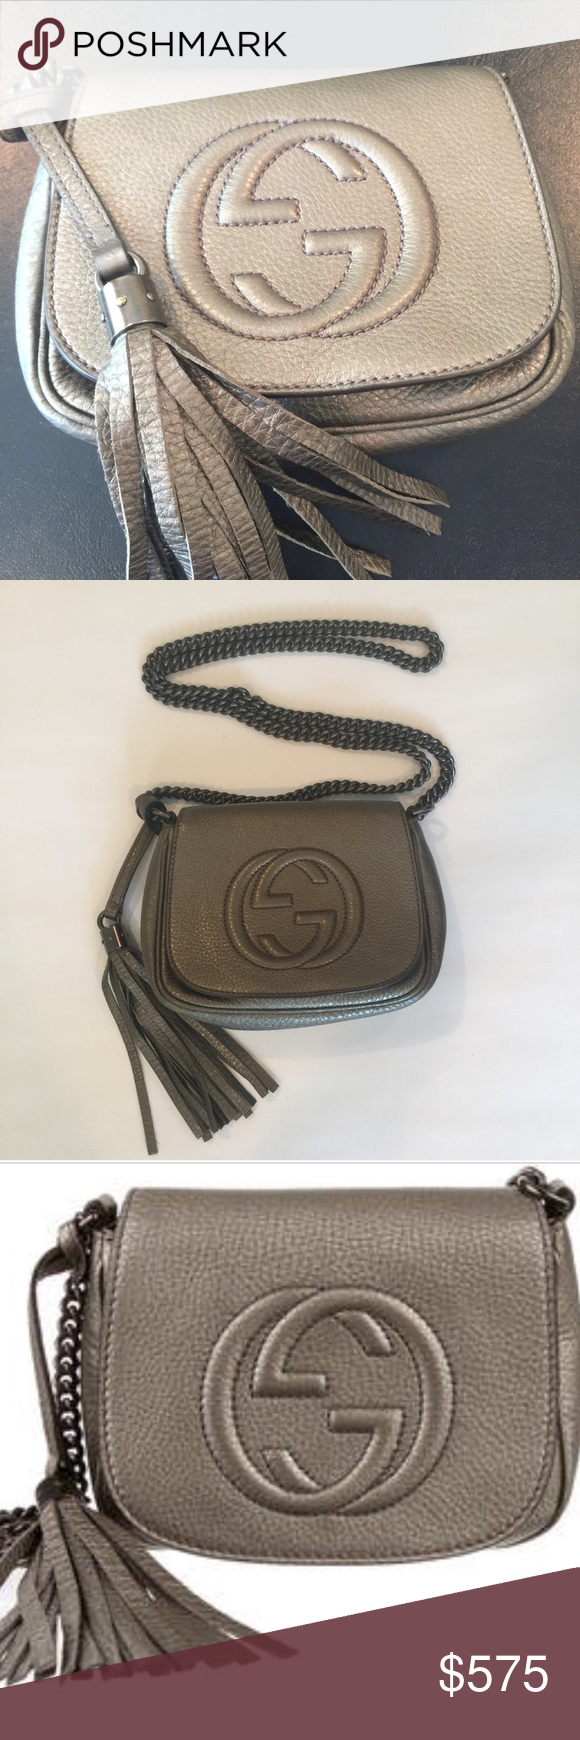 9e10738a3f76 Gucci soho crossbody chain handbag. Authentic Authentic. Pewter pebbled leather  Gucci Soho Chain Crossbody